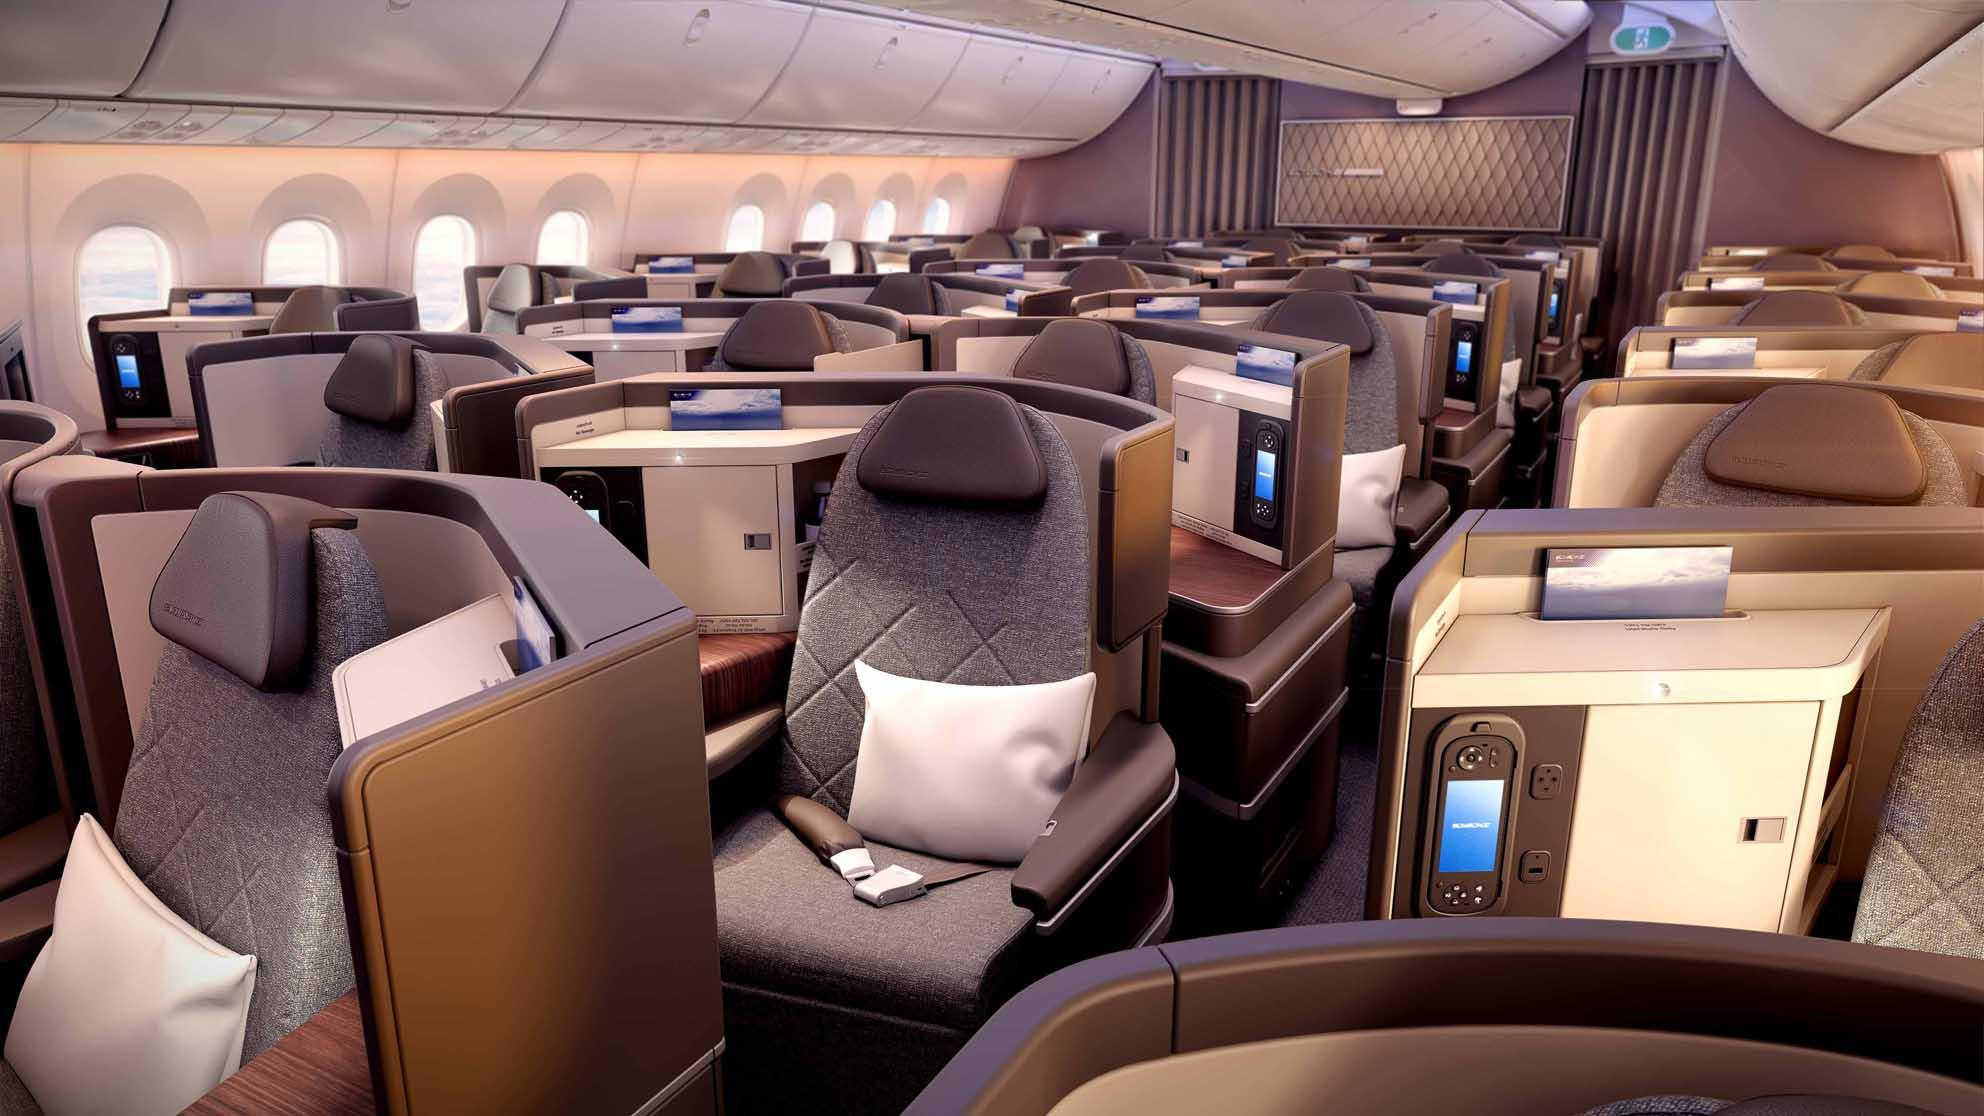 Recaro seeks to drive efficiencies with IoT of aircraft seats - Runway Girl